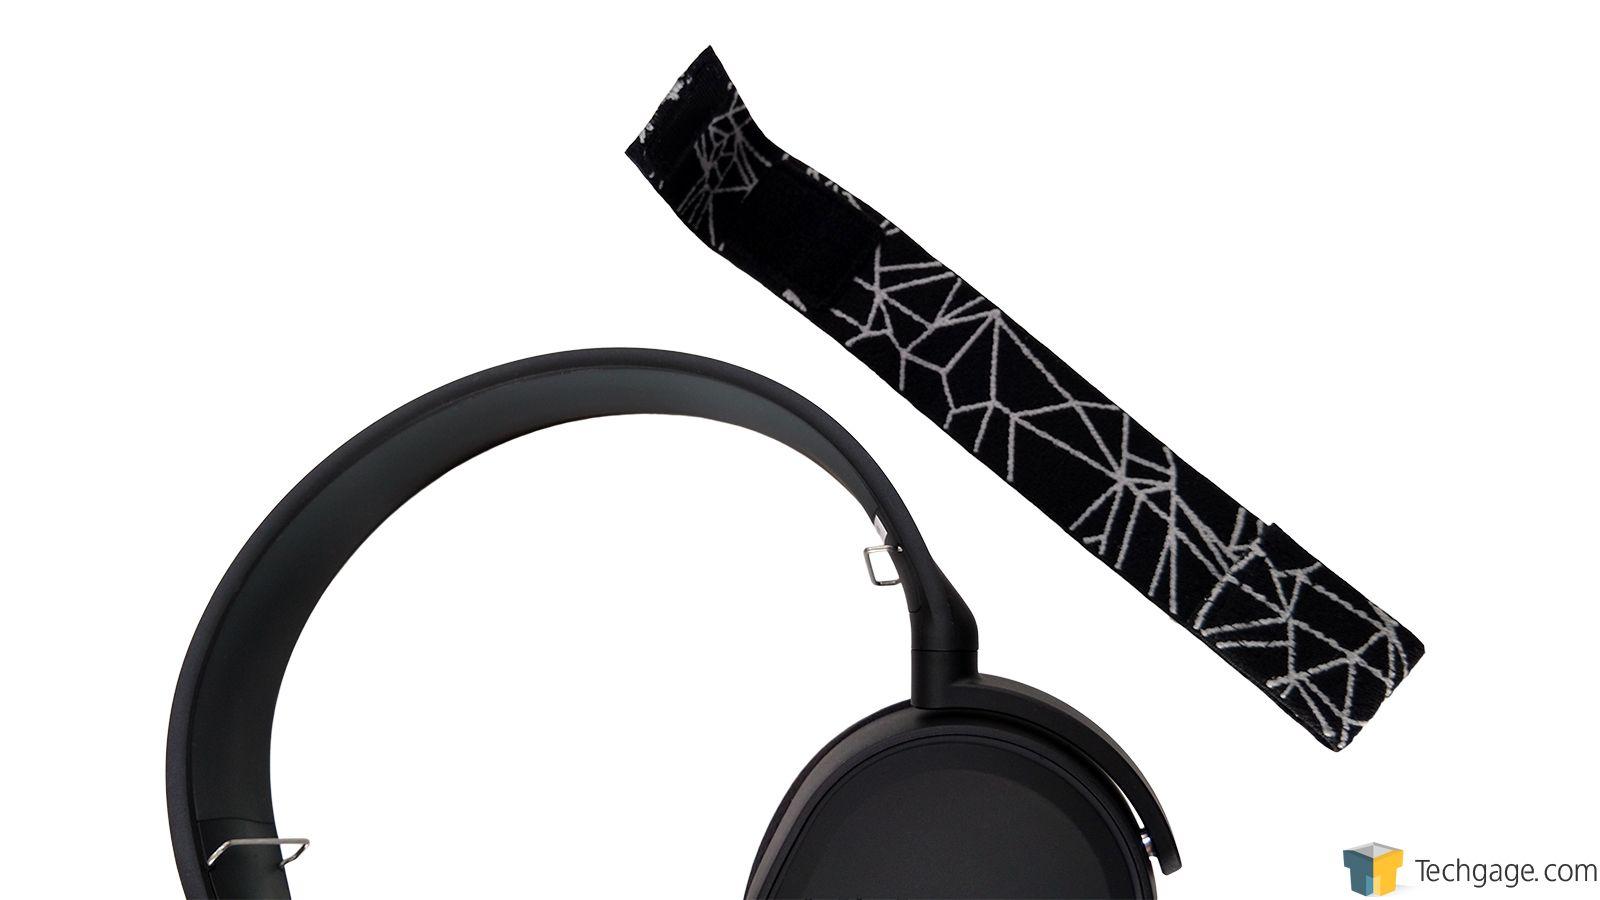 SteelSeries Arctis 5 7.1 Surround Sound RGB Headset Review – Techgage